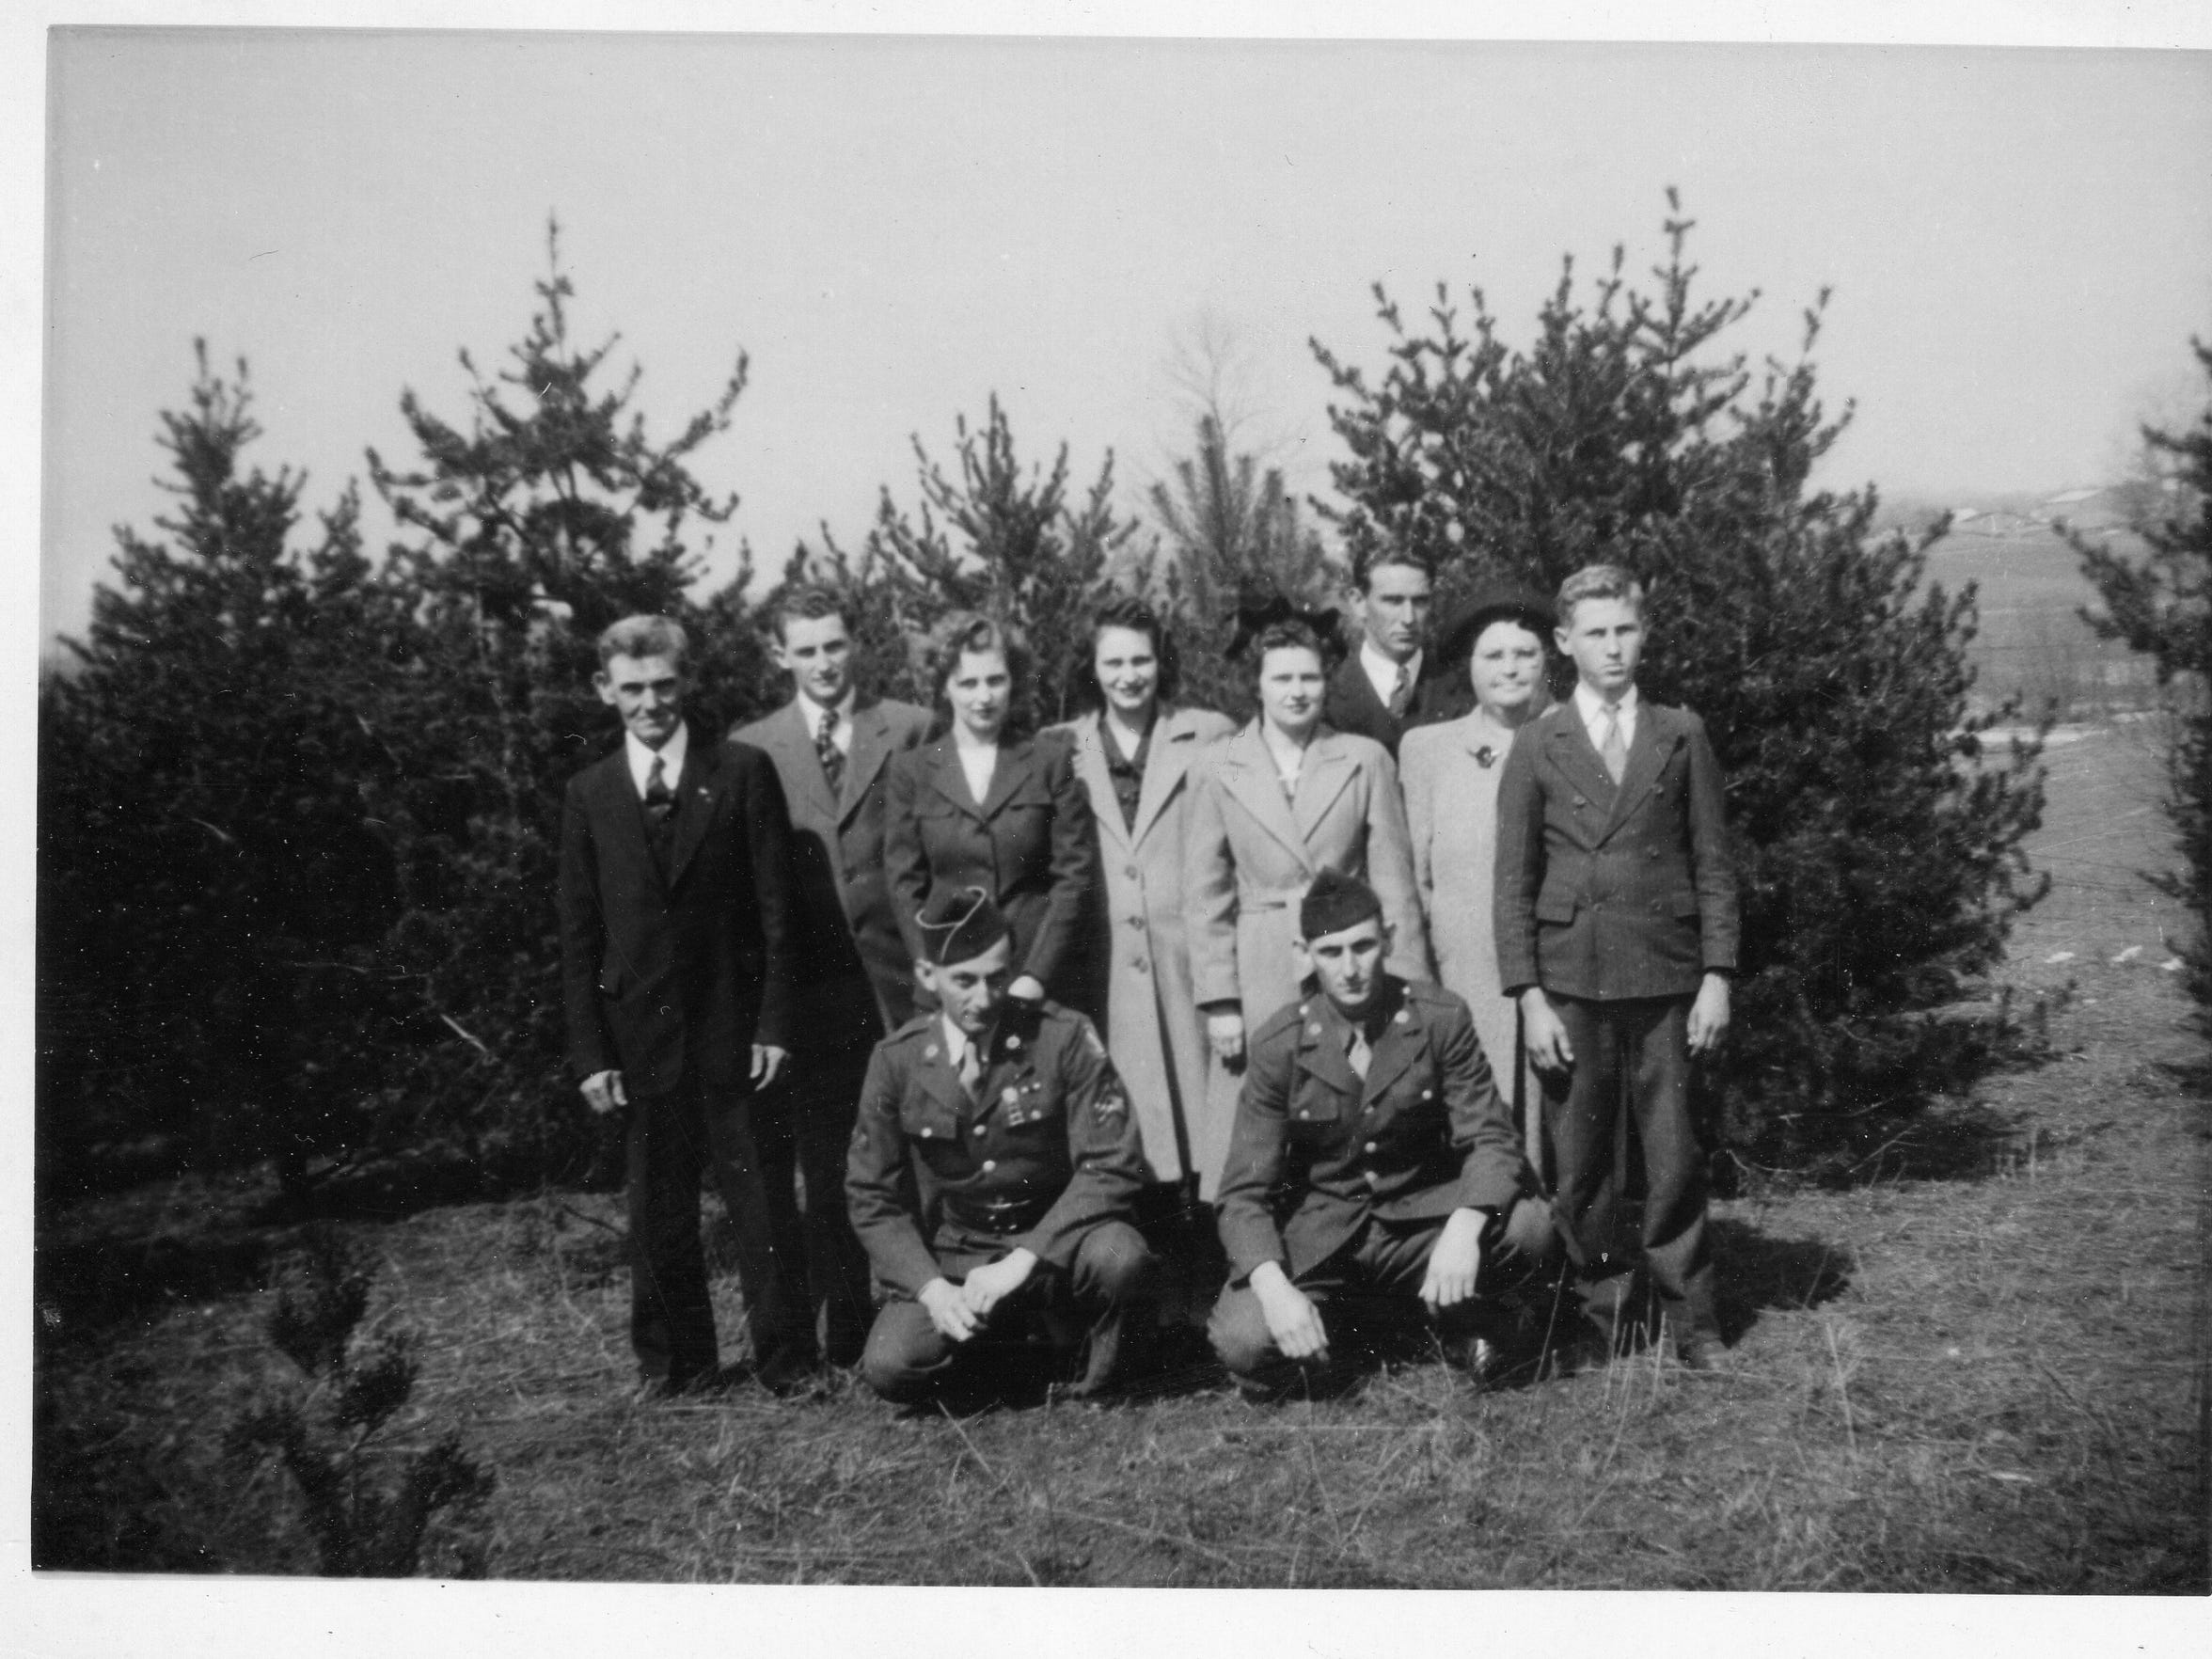 Part of the Merkley family. Kneeling in front left